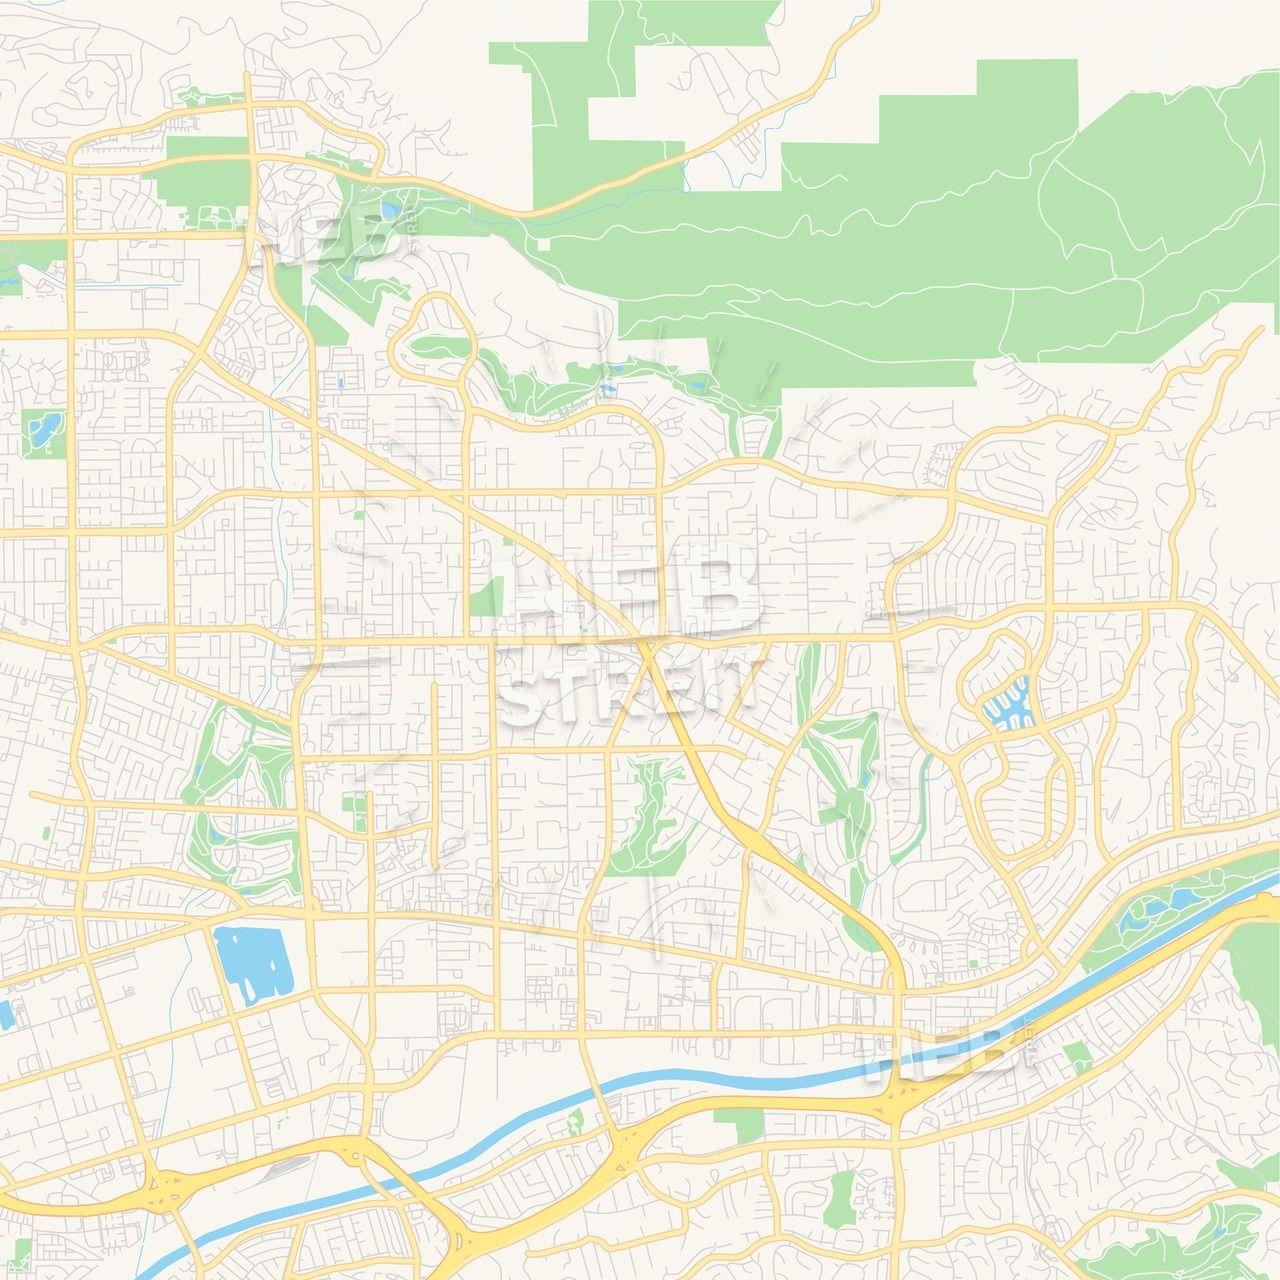 Empty vector map of Yorba Linda, California, USA | Maps ... on placentia map, san lorenzo map, linda cal map, covington map, gresham map, woodland map, linda ca map, ione map, kalamazoo map, sherman oaks map, whittier blvd map, oak view map, south los angeles map, elberton map, santa ysabel map, los alamitos map, san dimas map, claremont map, downey map, madison heights map,